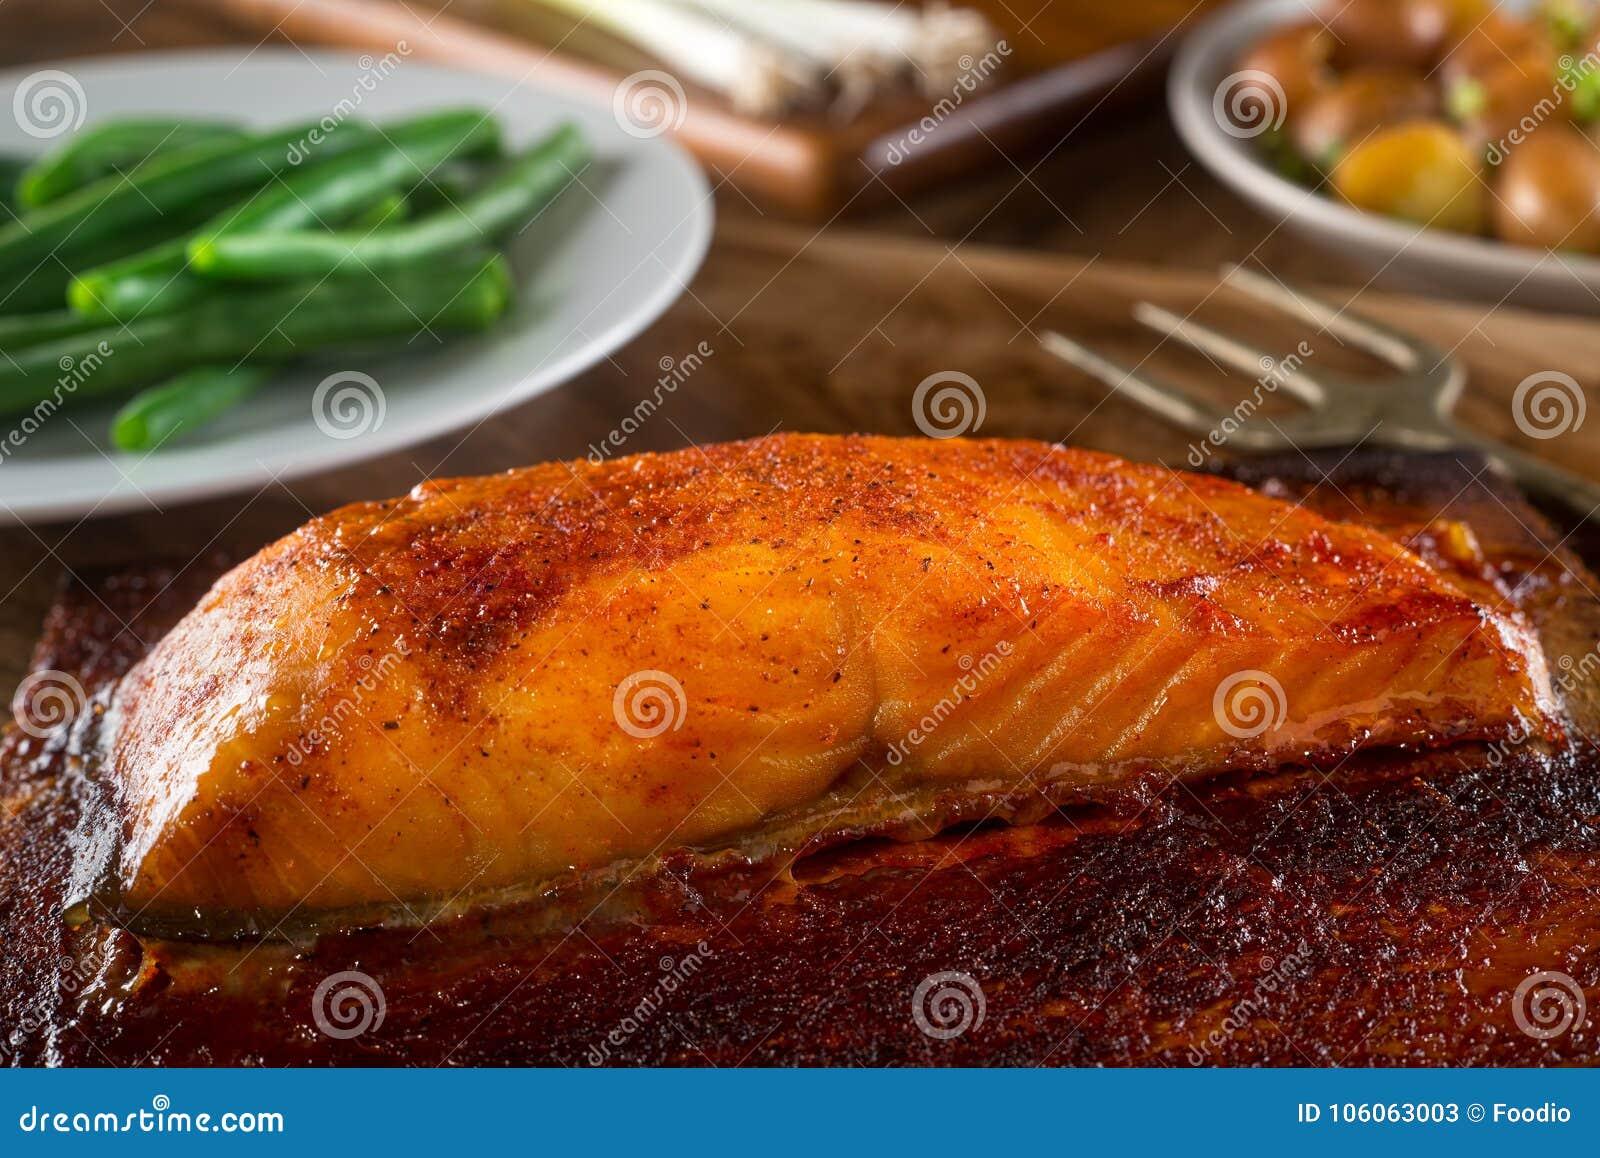 Barbecue Cedar Plank Salmon